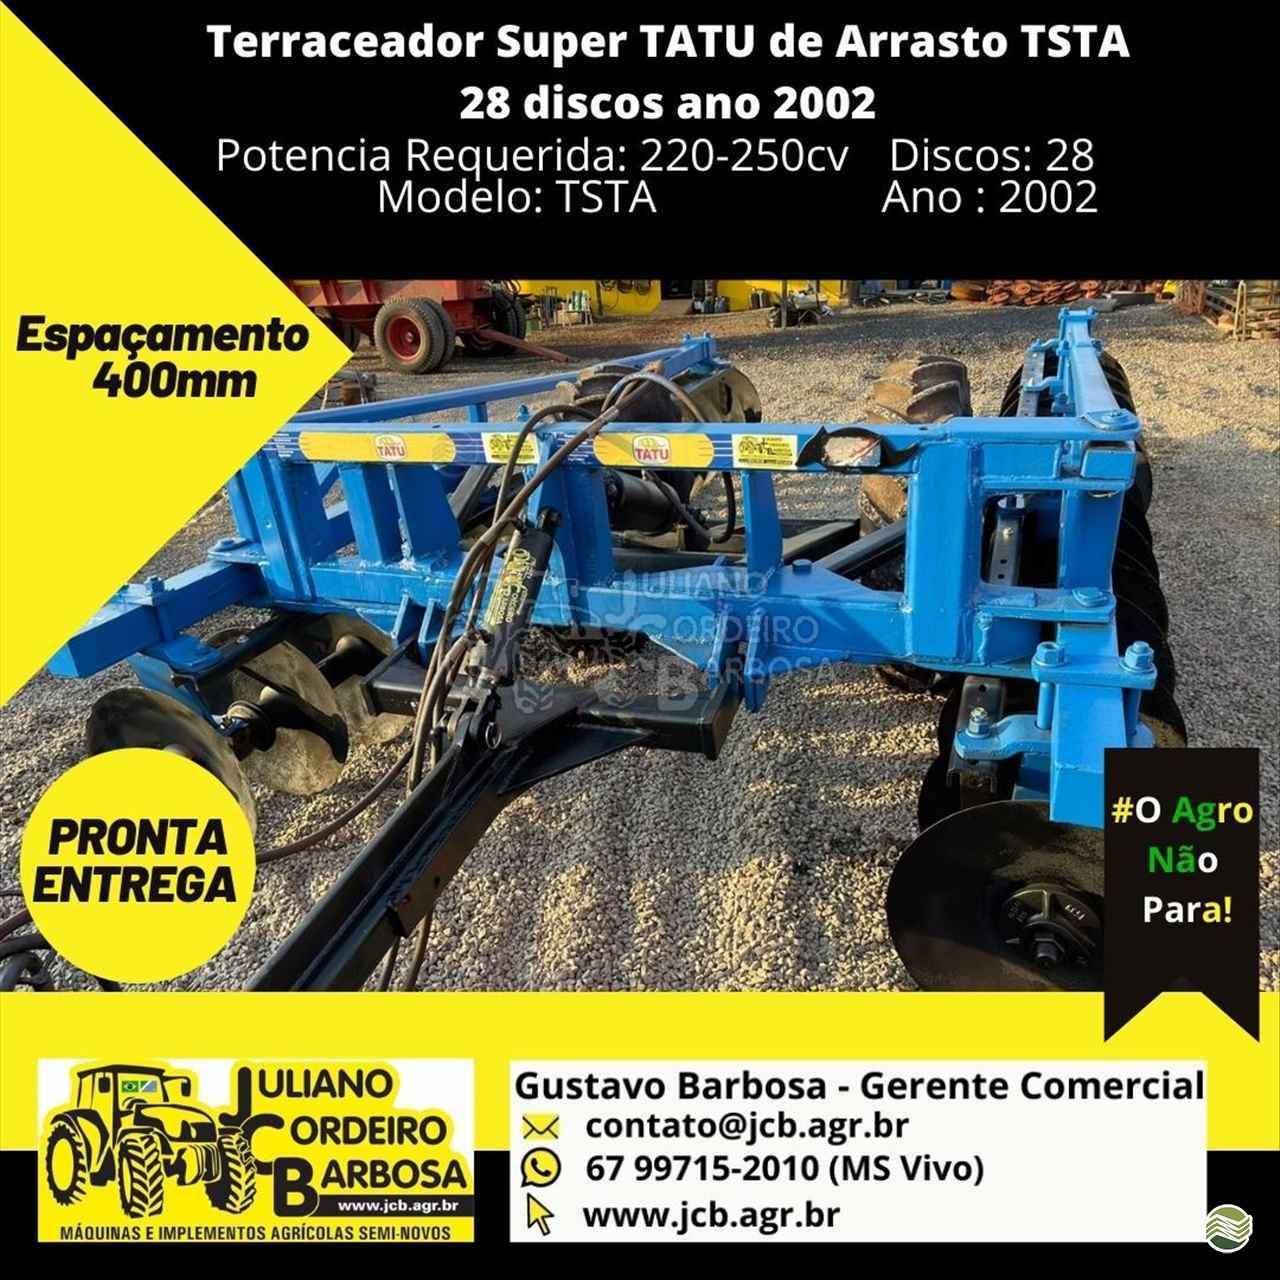 IMPLEMENTOS AGRICOLAS TERRACEADOR 28 DISCOS JCB Máquinas e Implementos Agrícolas MARACAJU MATO GROSSO DO SUL MS